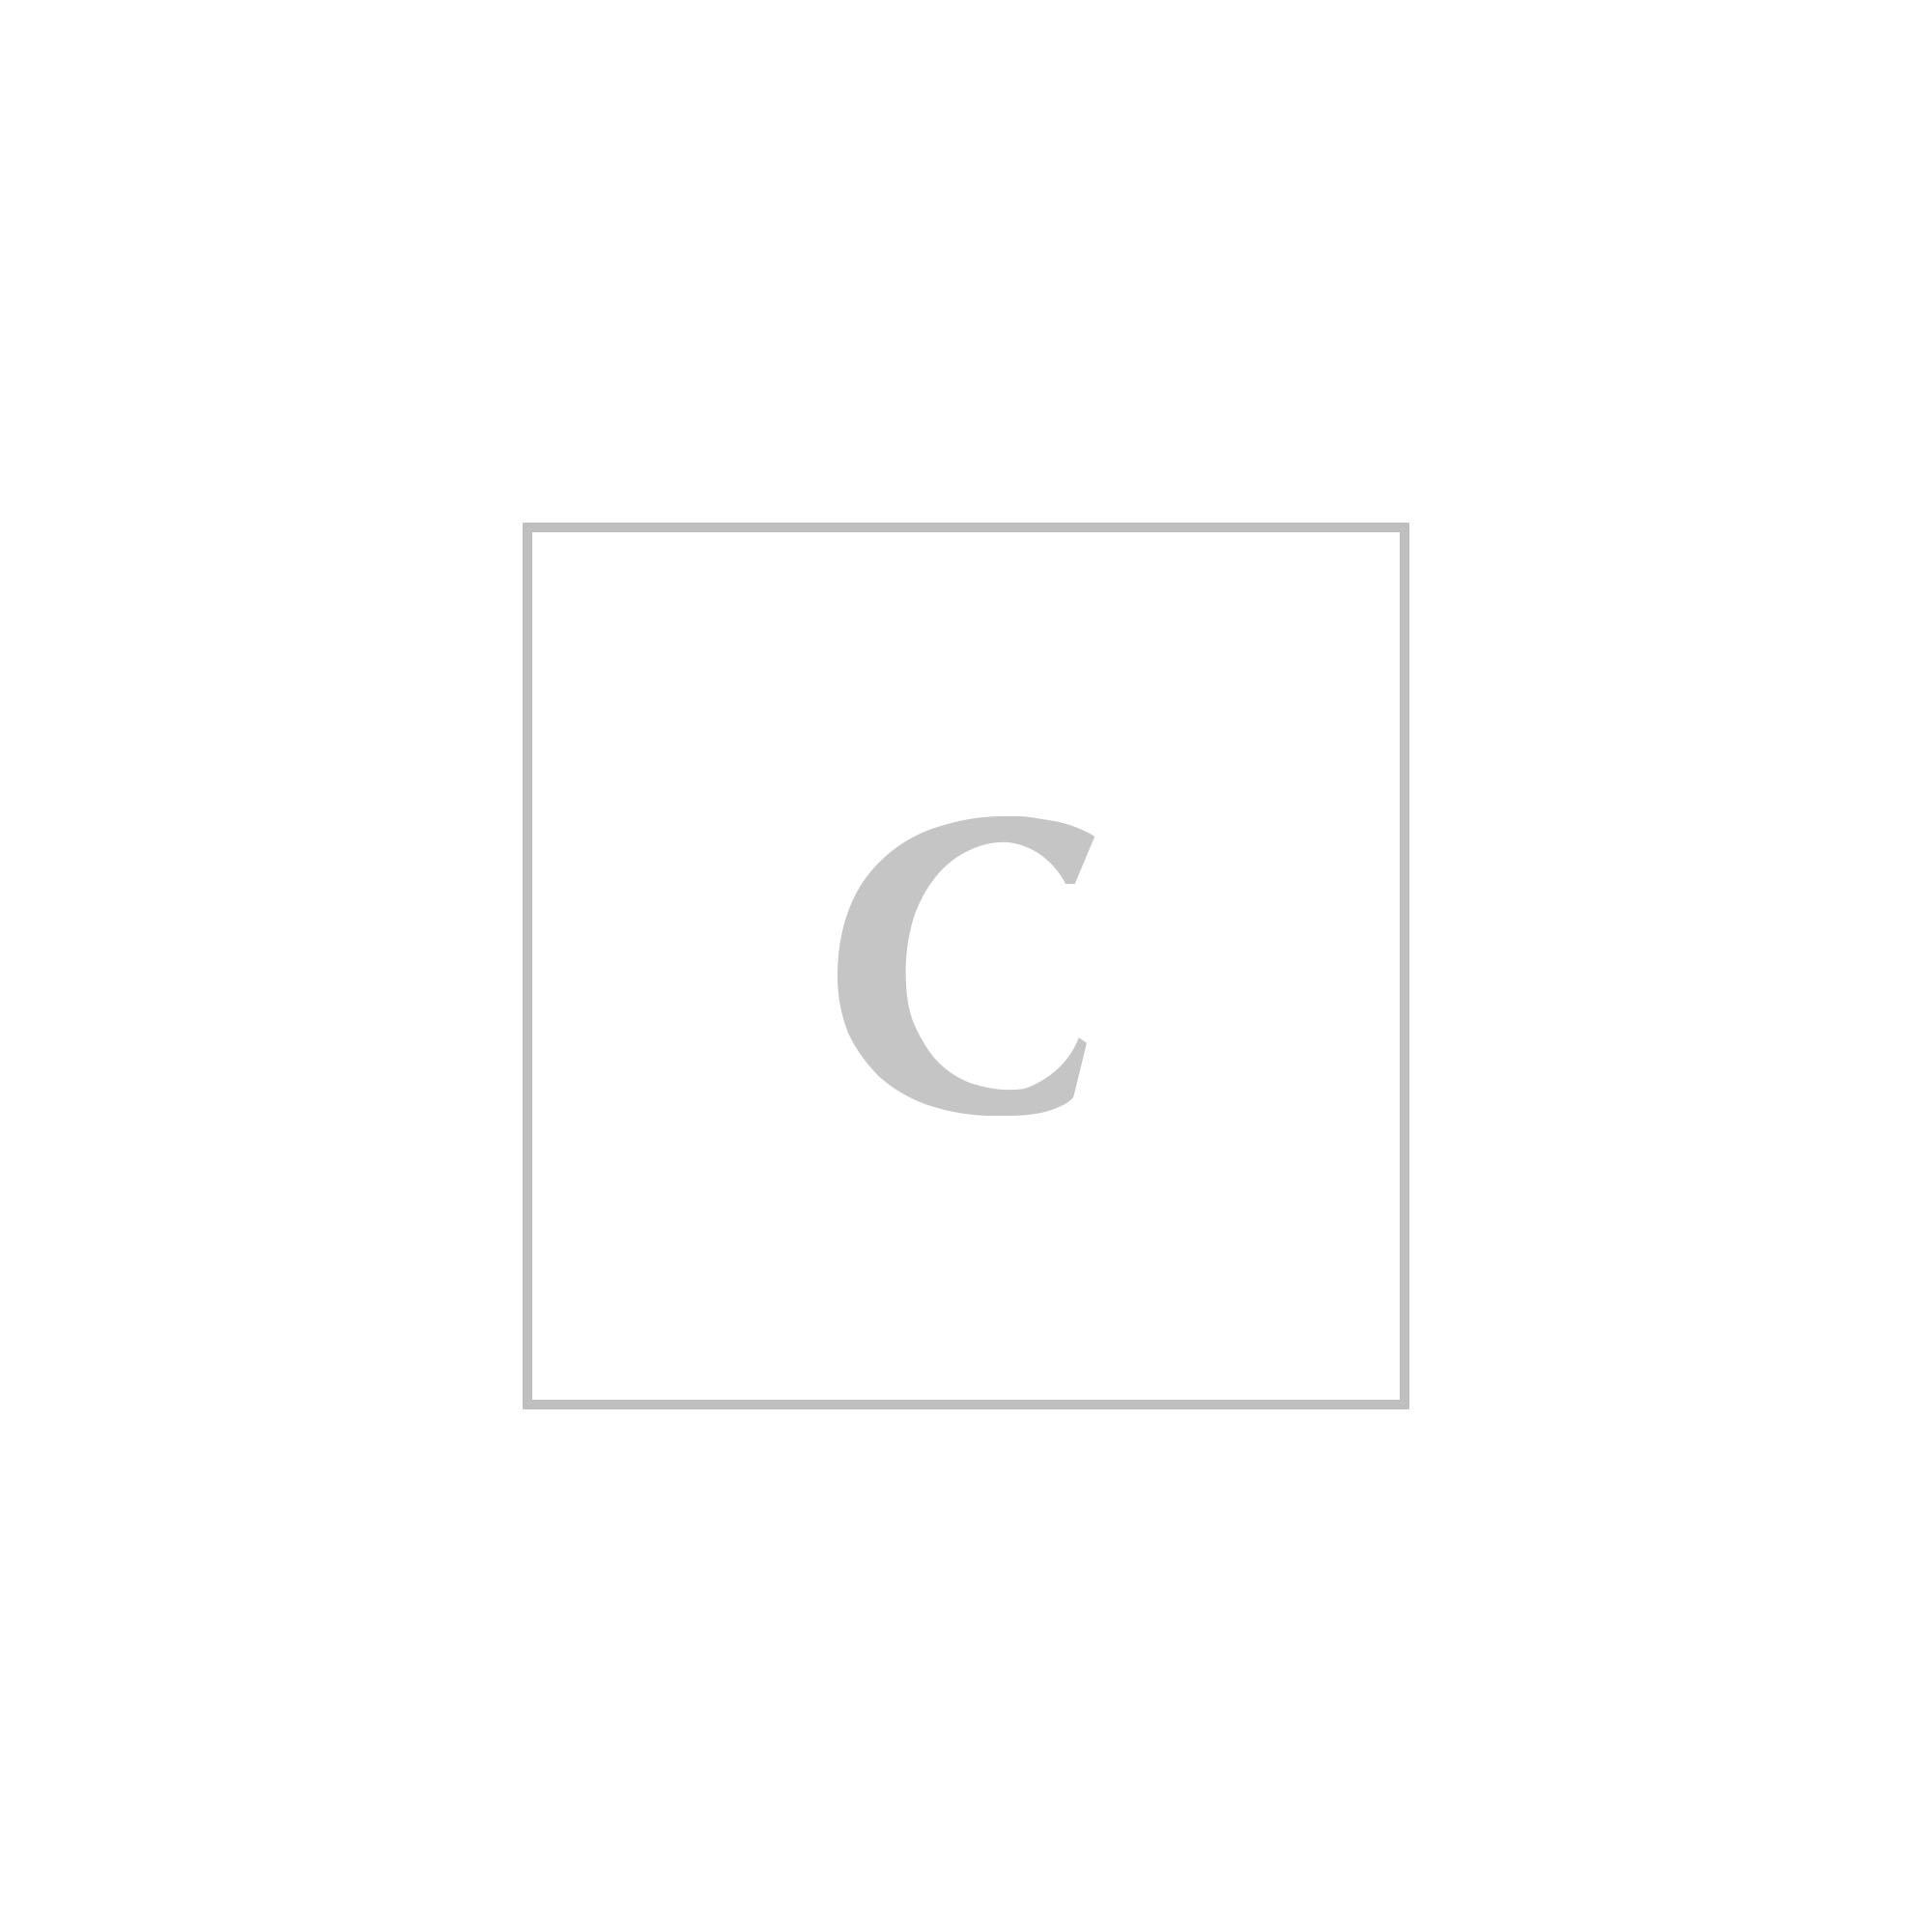 Dolce & gabbana piattina nylon corone/api+dauphine